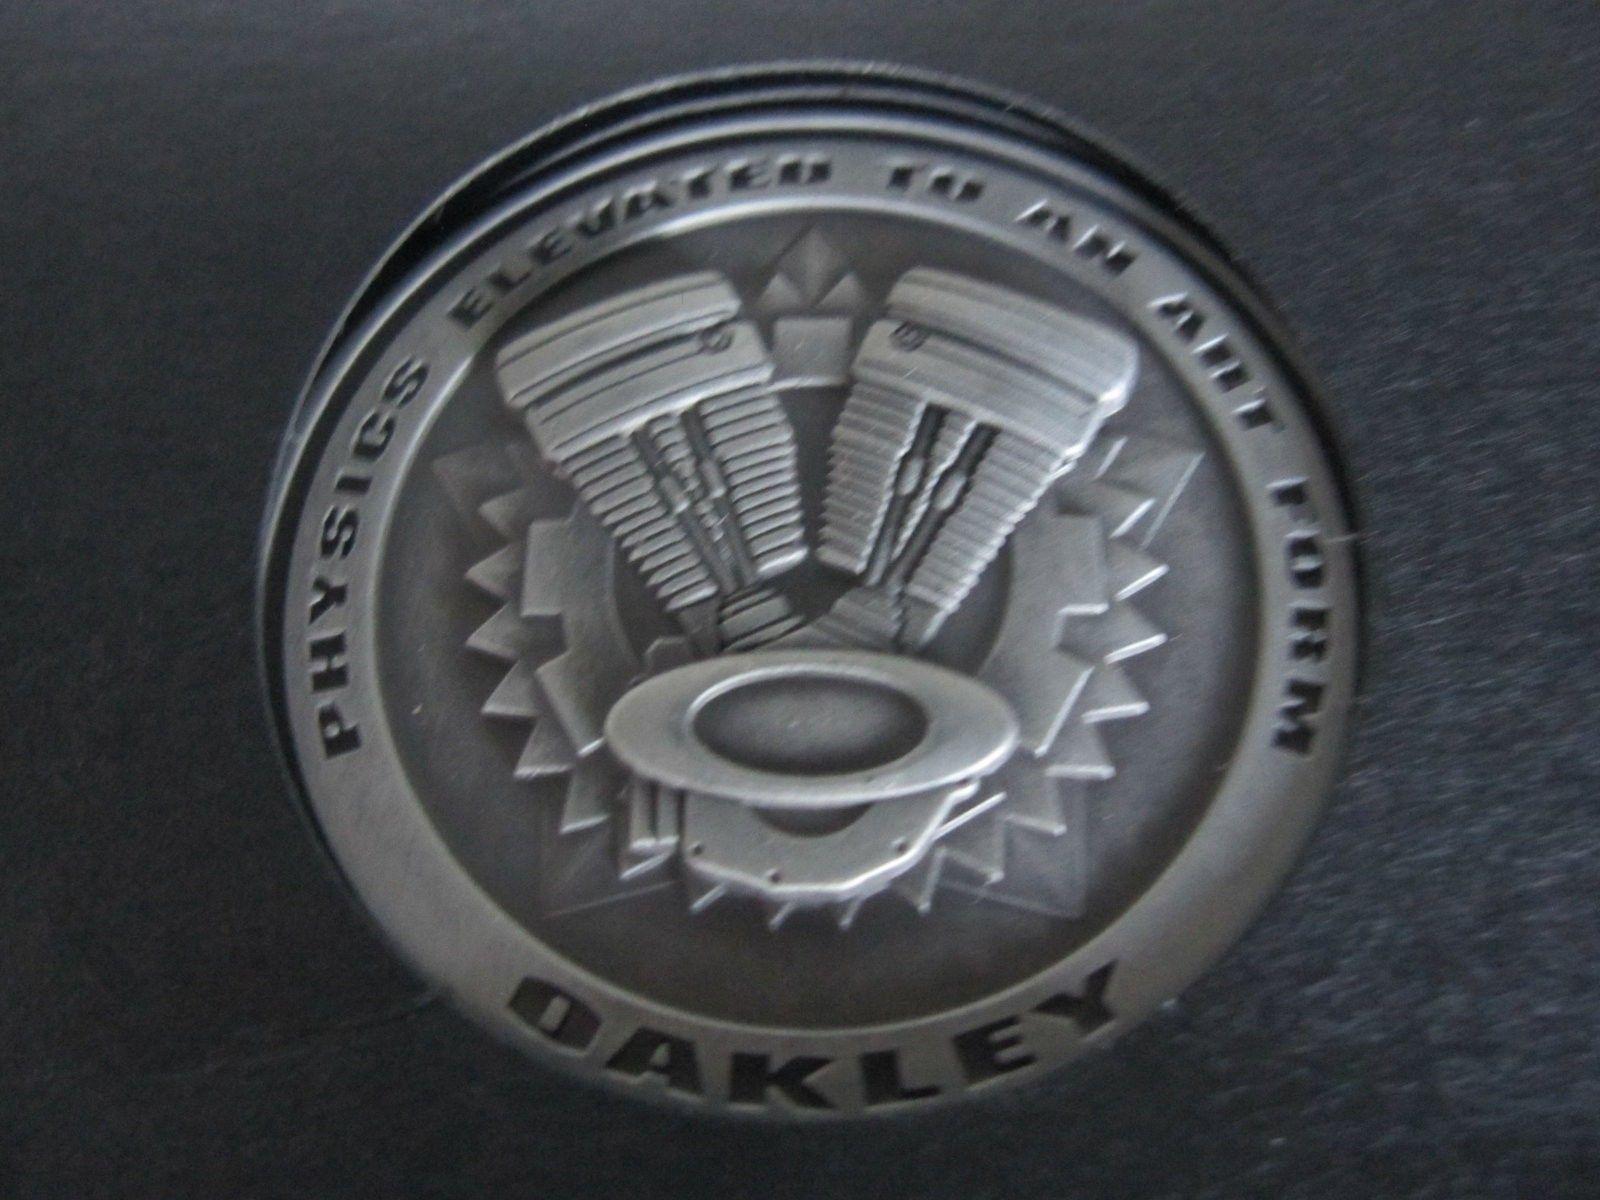 Box & coin for XS OO BIP - sku # 6011-08 - *** $70 *** - IMG_5546.JPG